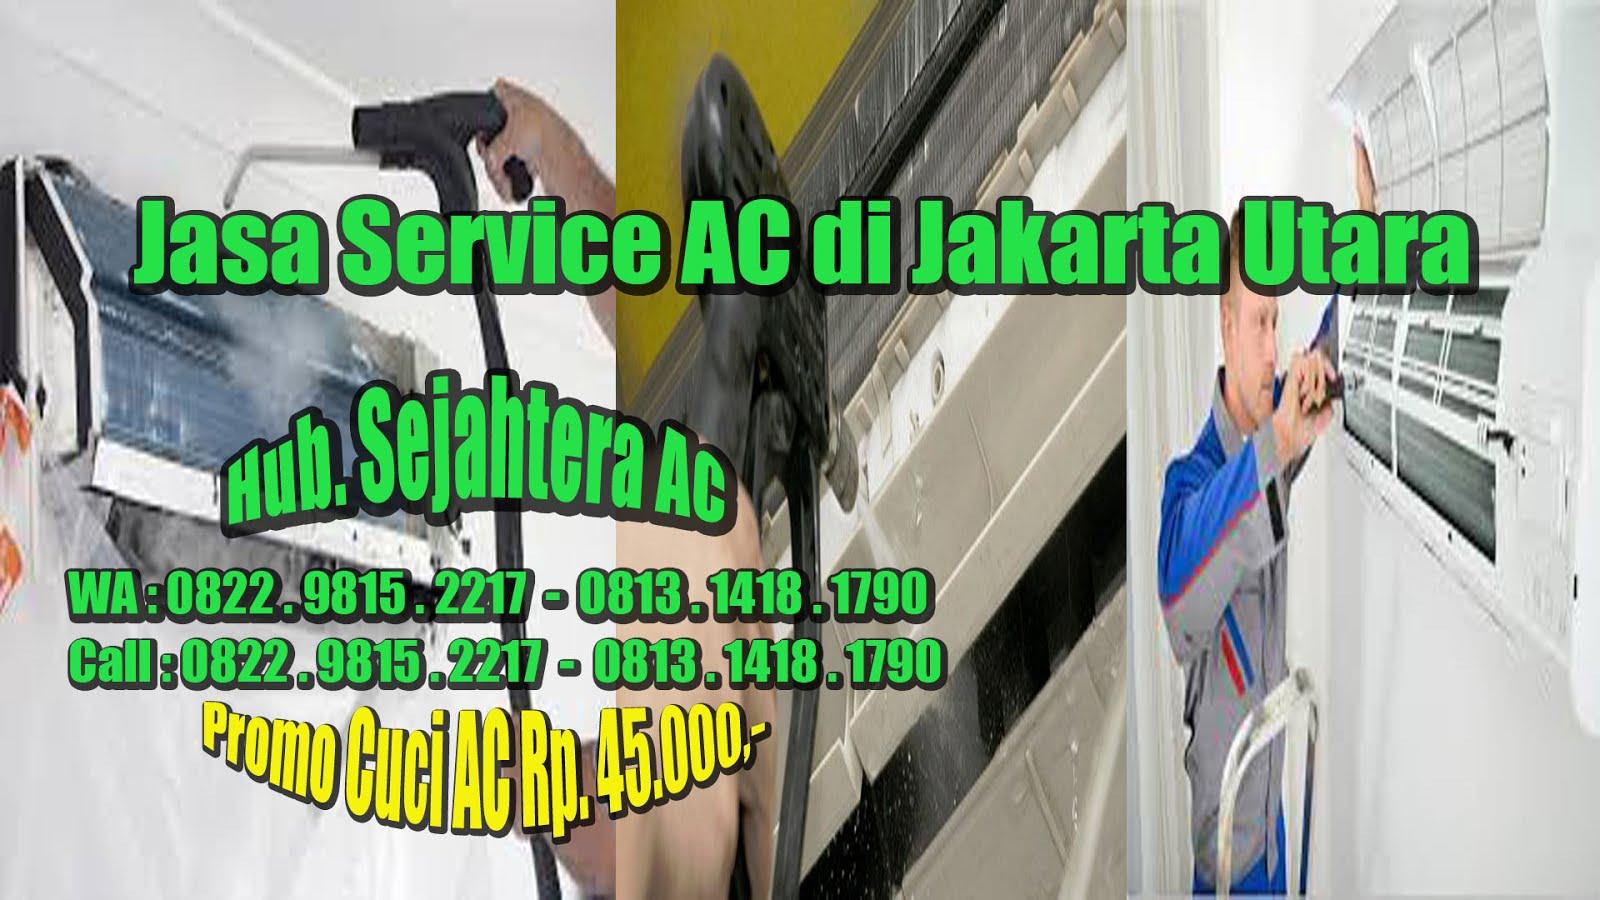 Jasa Service AC Di Jakarta Utara